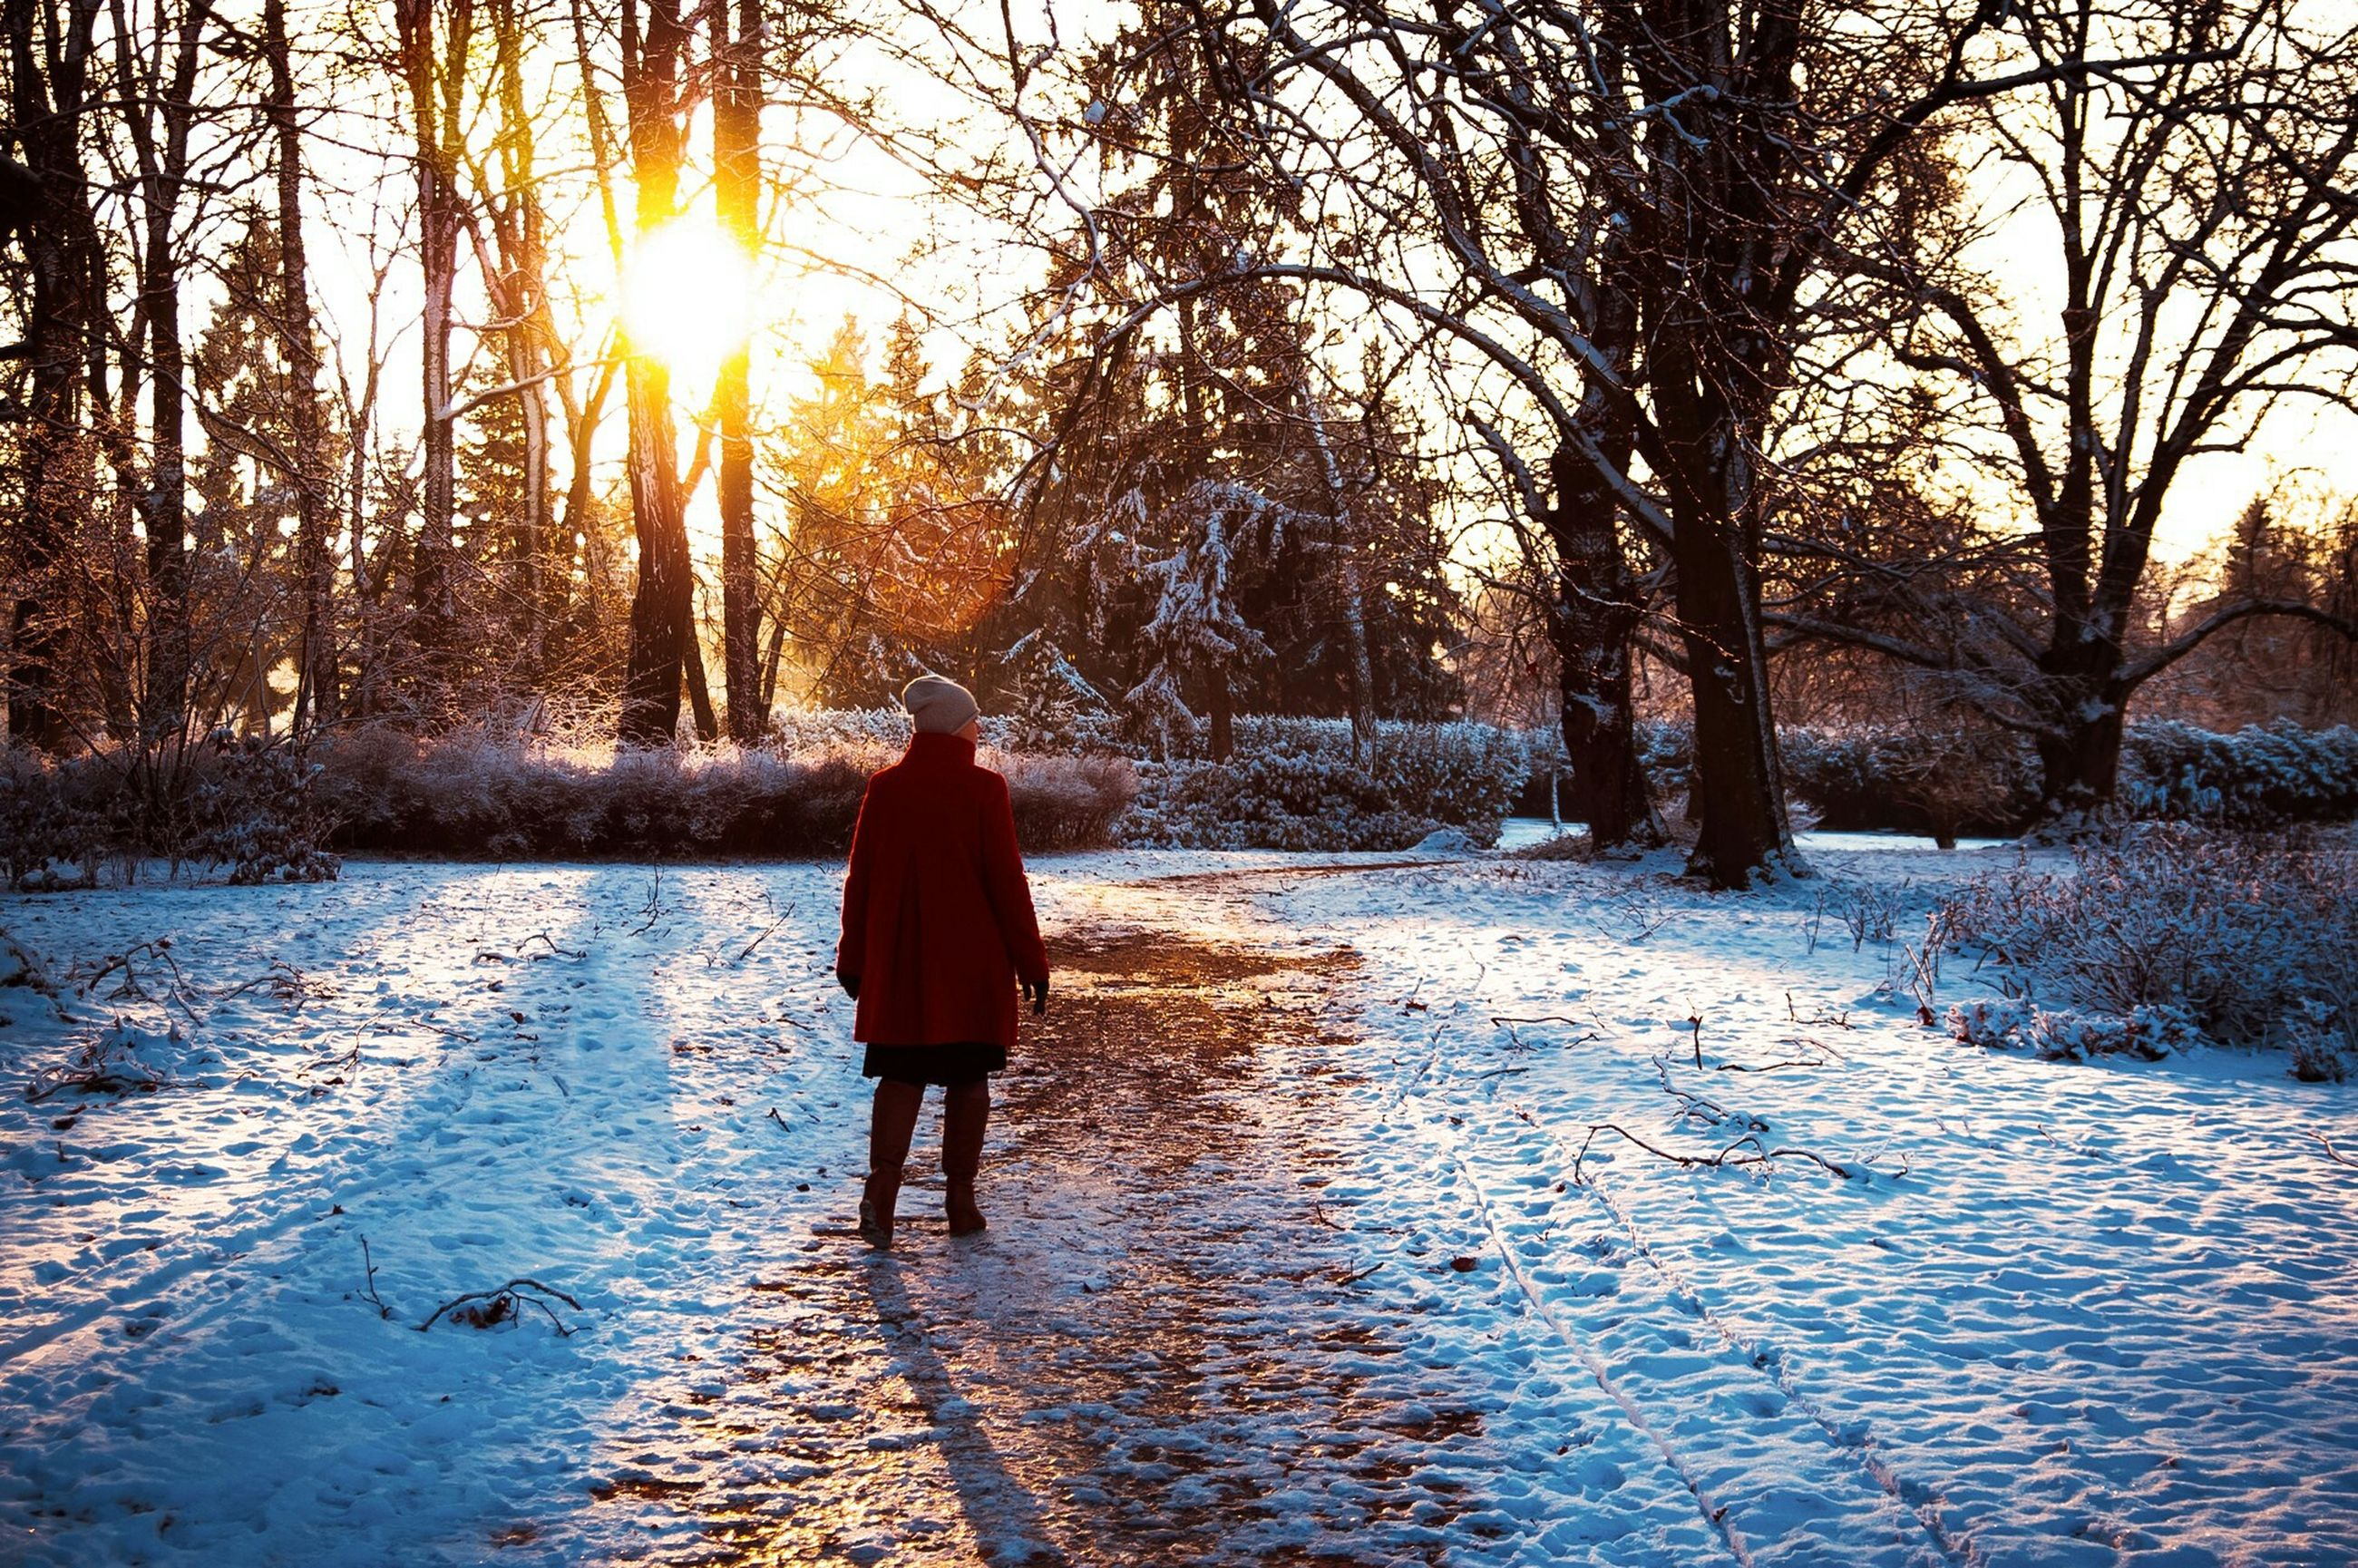 winter, snow, cold temperature, season, full length, rear view, walking, lifestyles, weather, leisure activity, tree, frozen, sun, water, standing, nature, men, sunlight